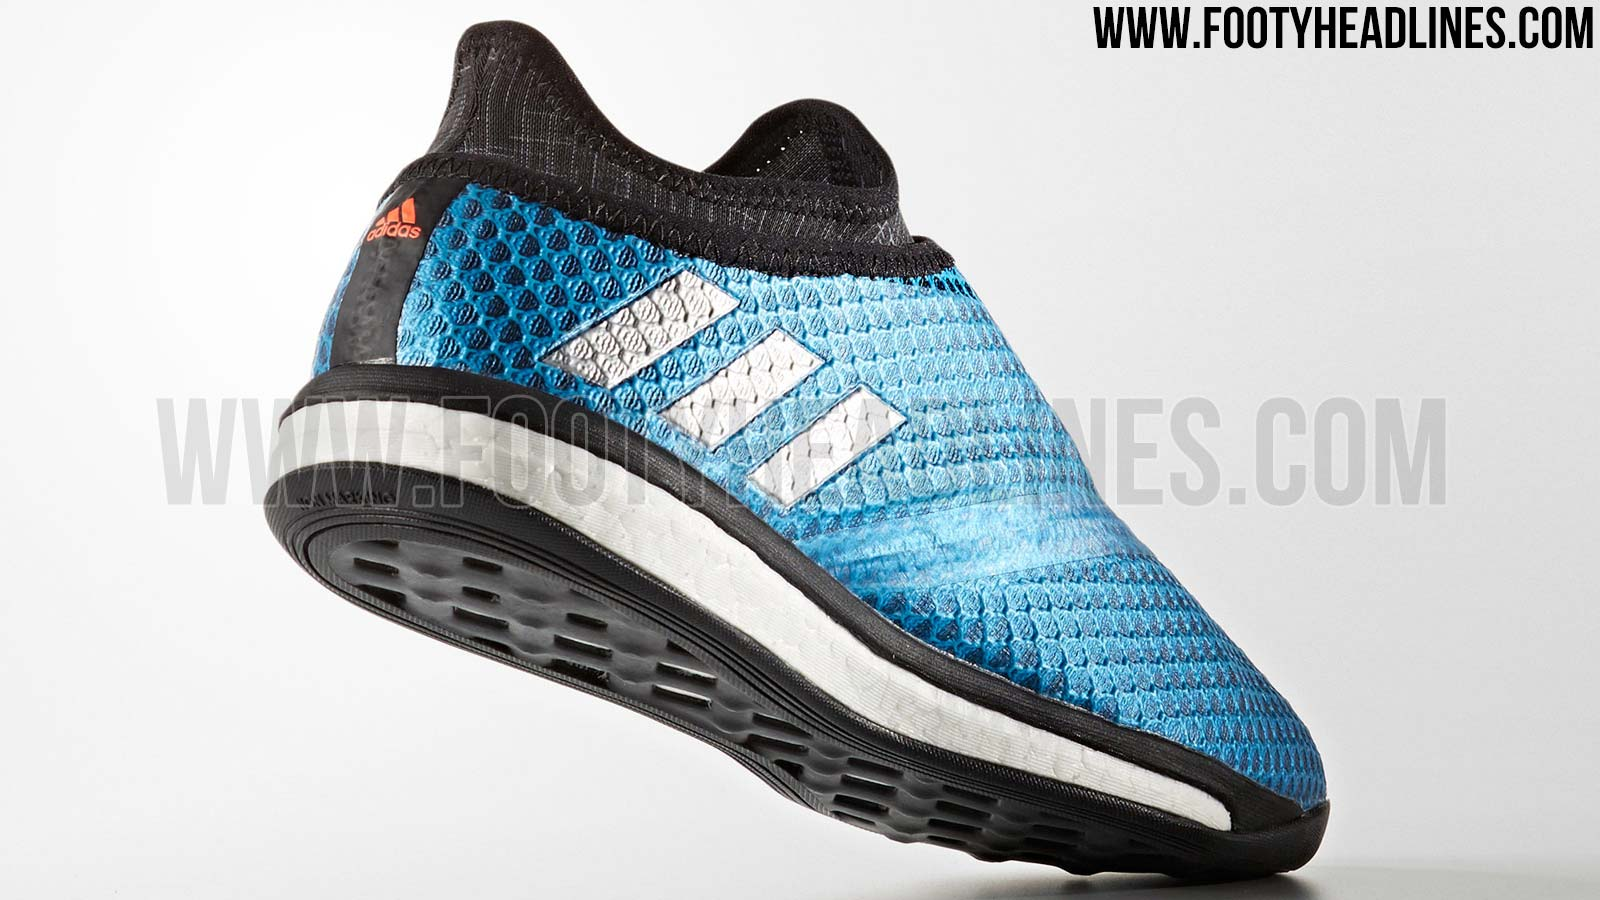 88f5bda39 Adidas Messi 16+ PureAgility Street - Shock Blue / Matte Silver / Black